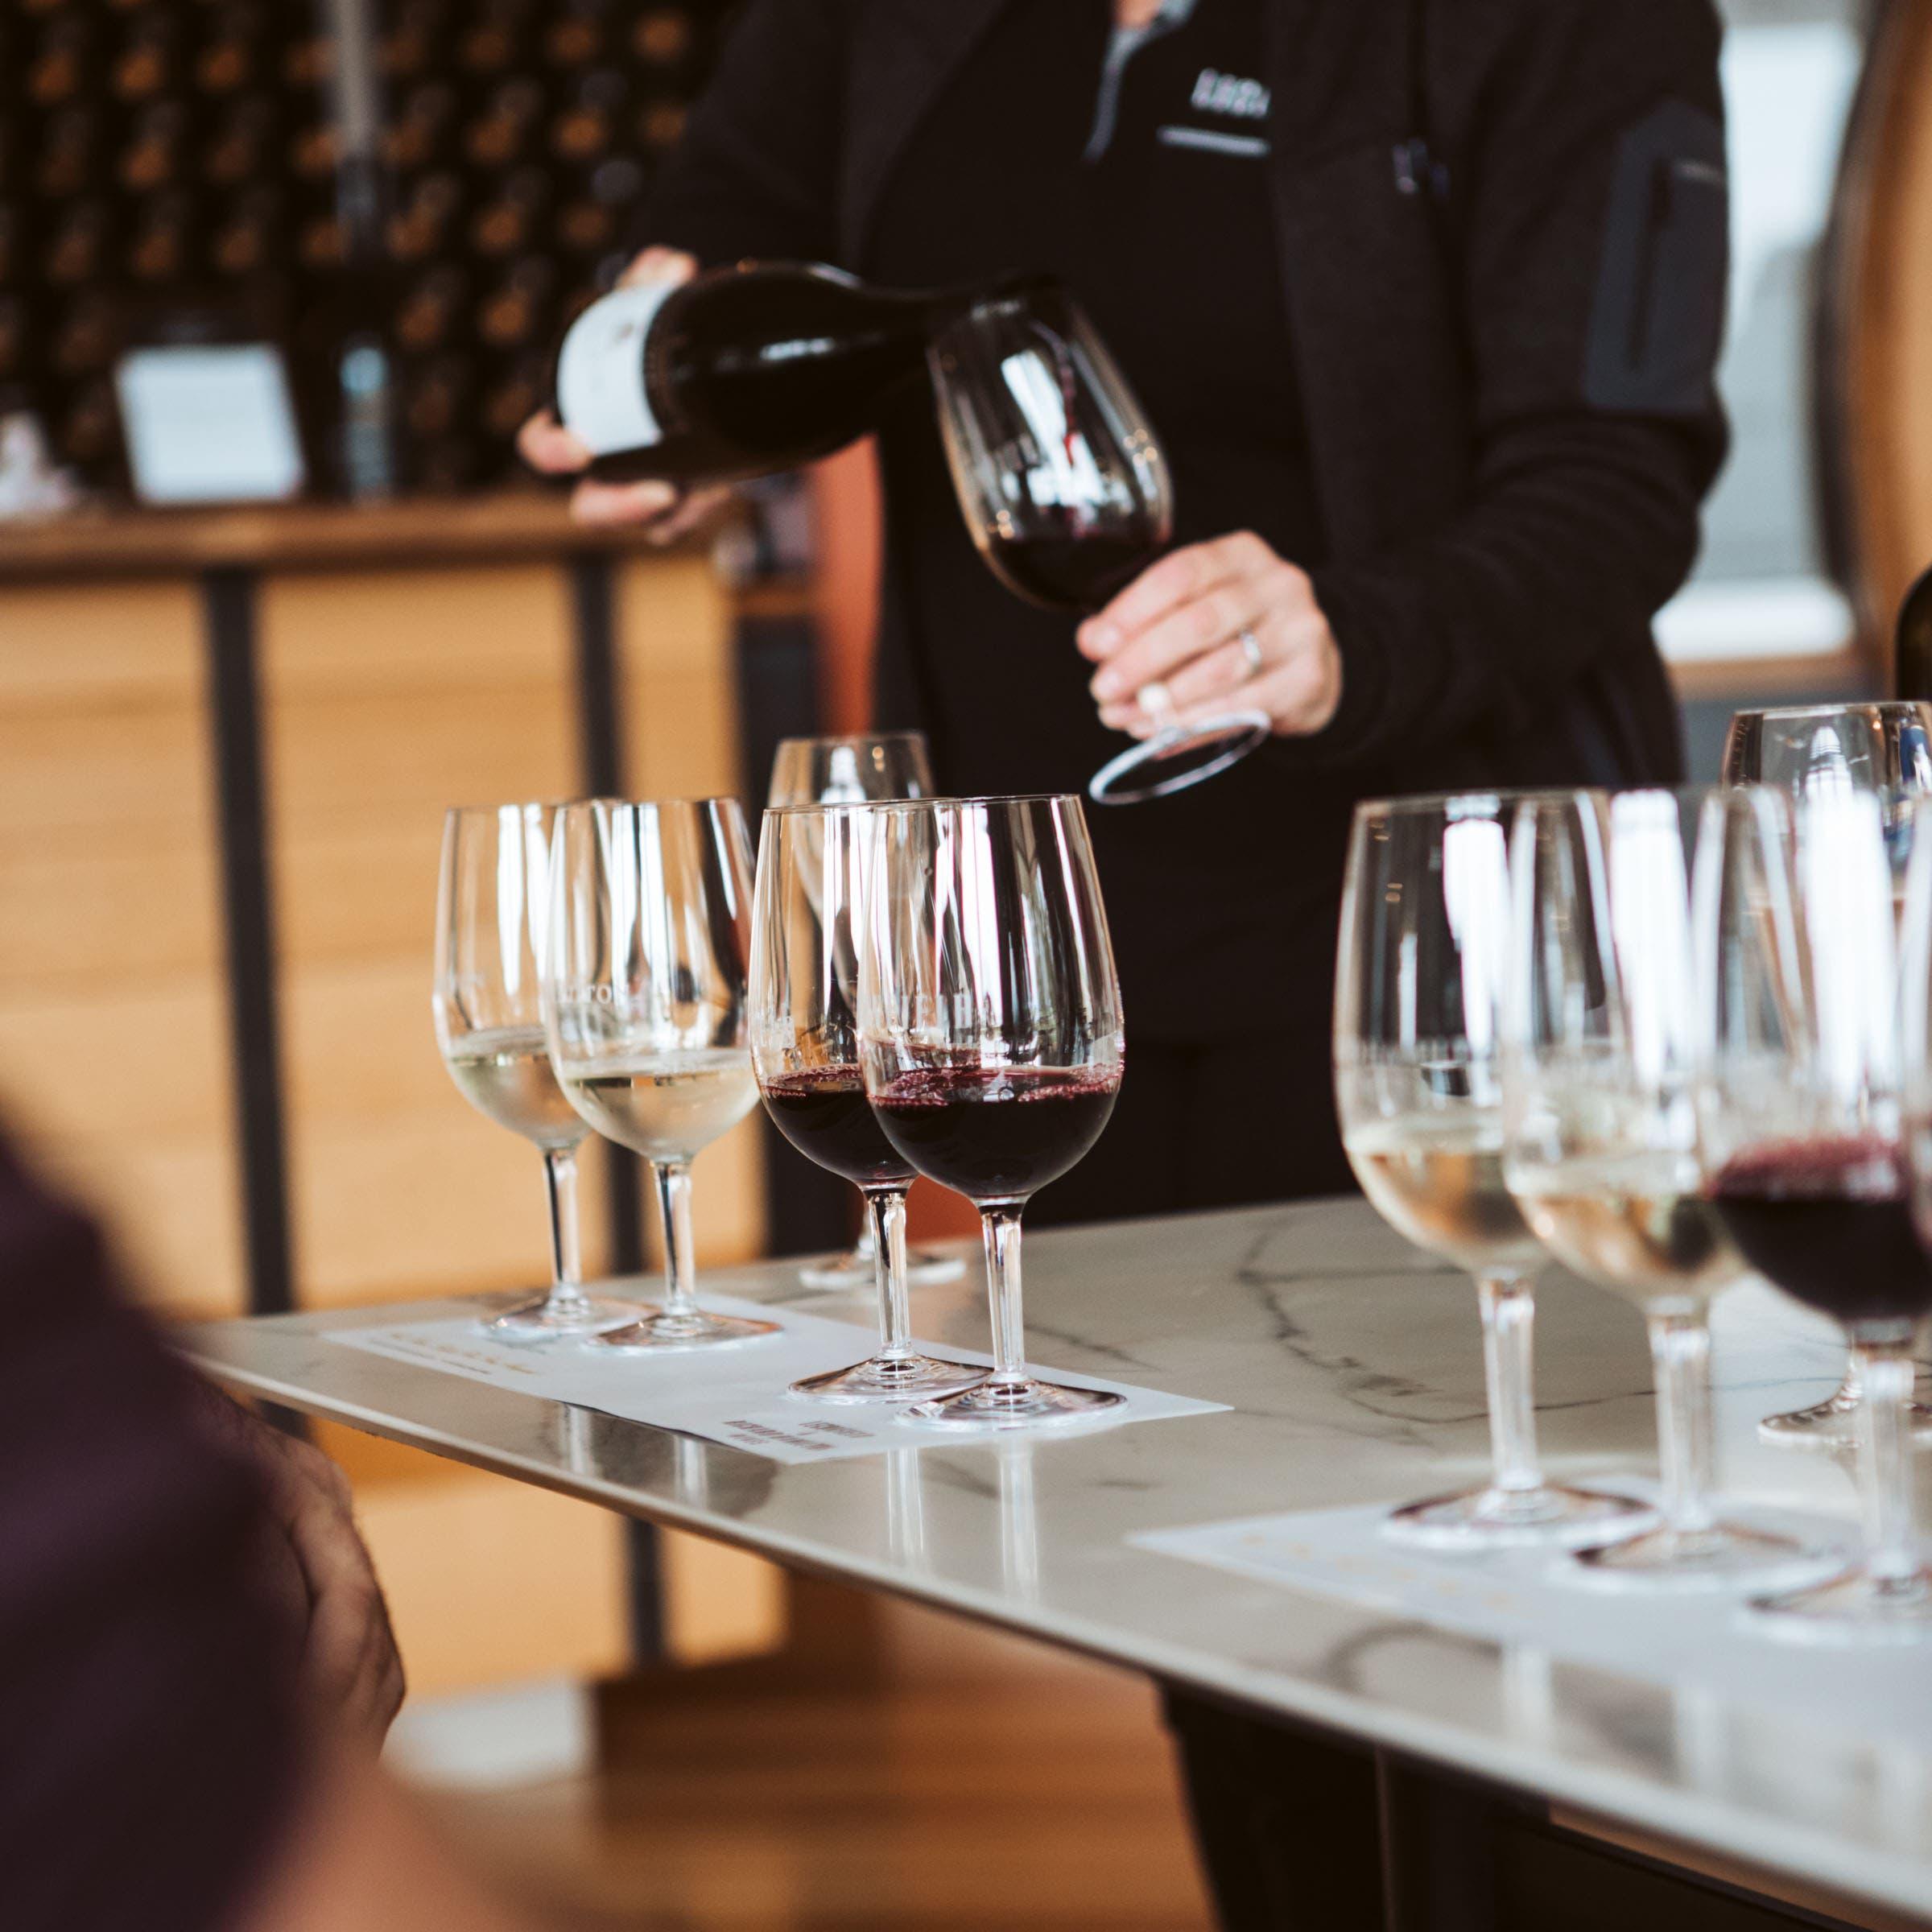 Leconfield & Richard Hamilton Wines